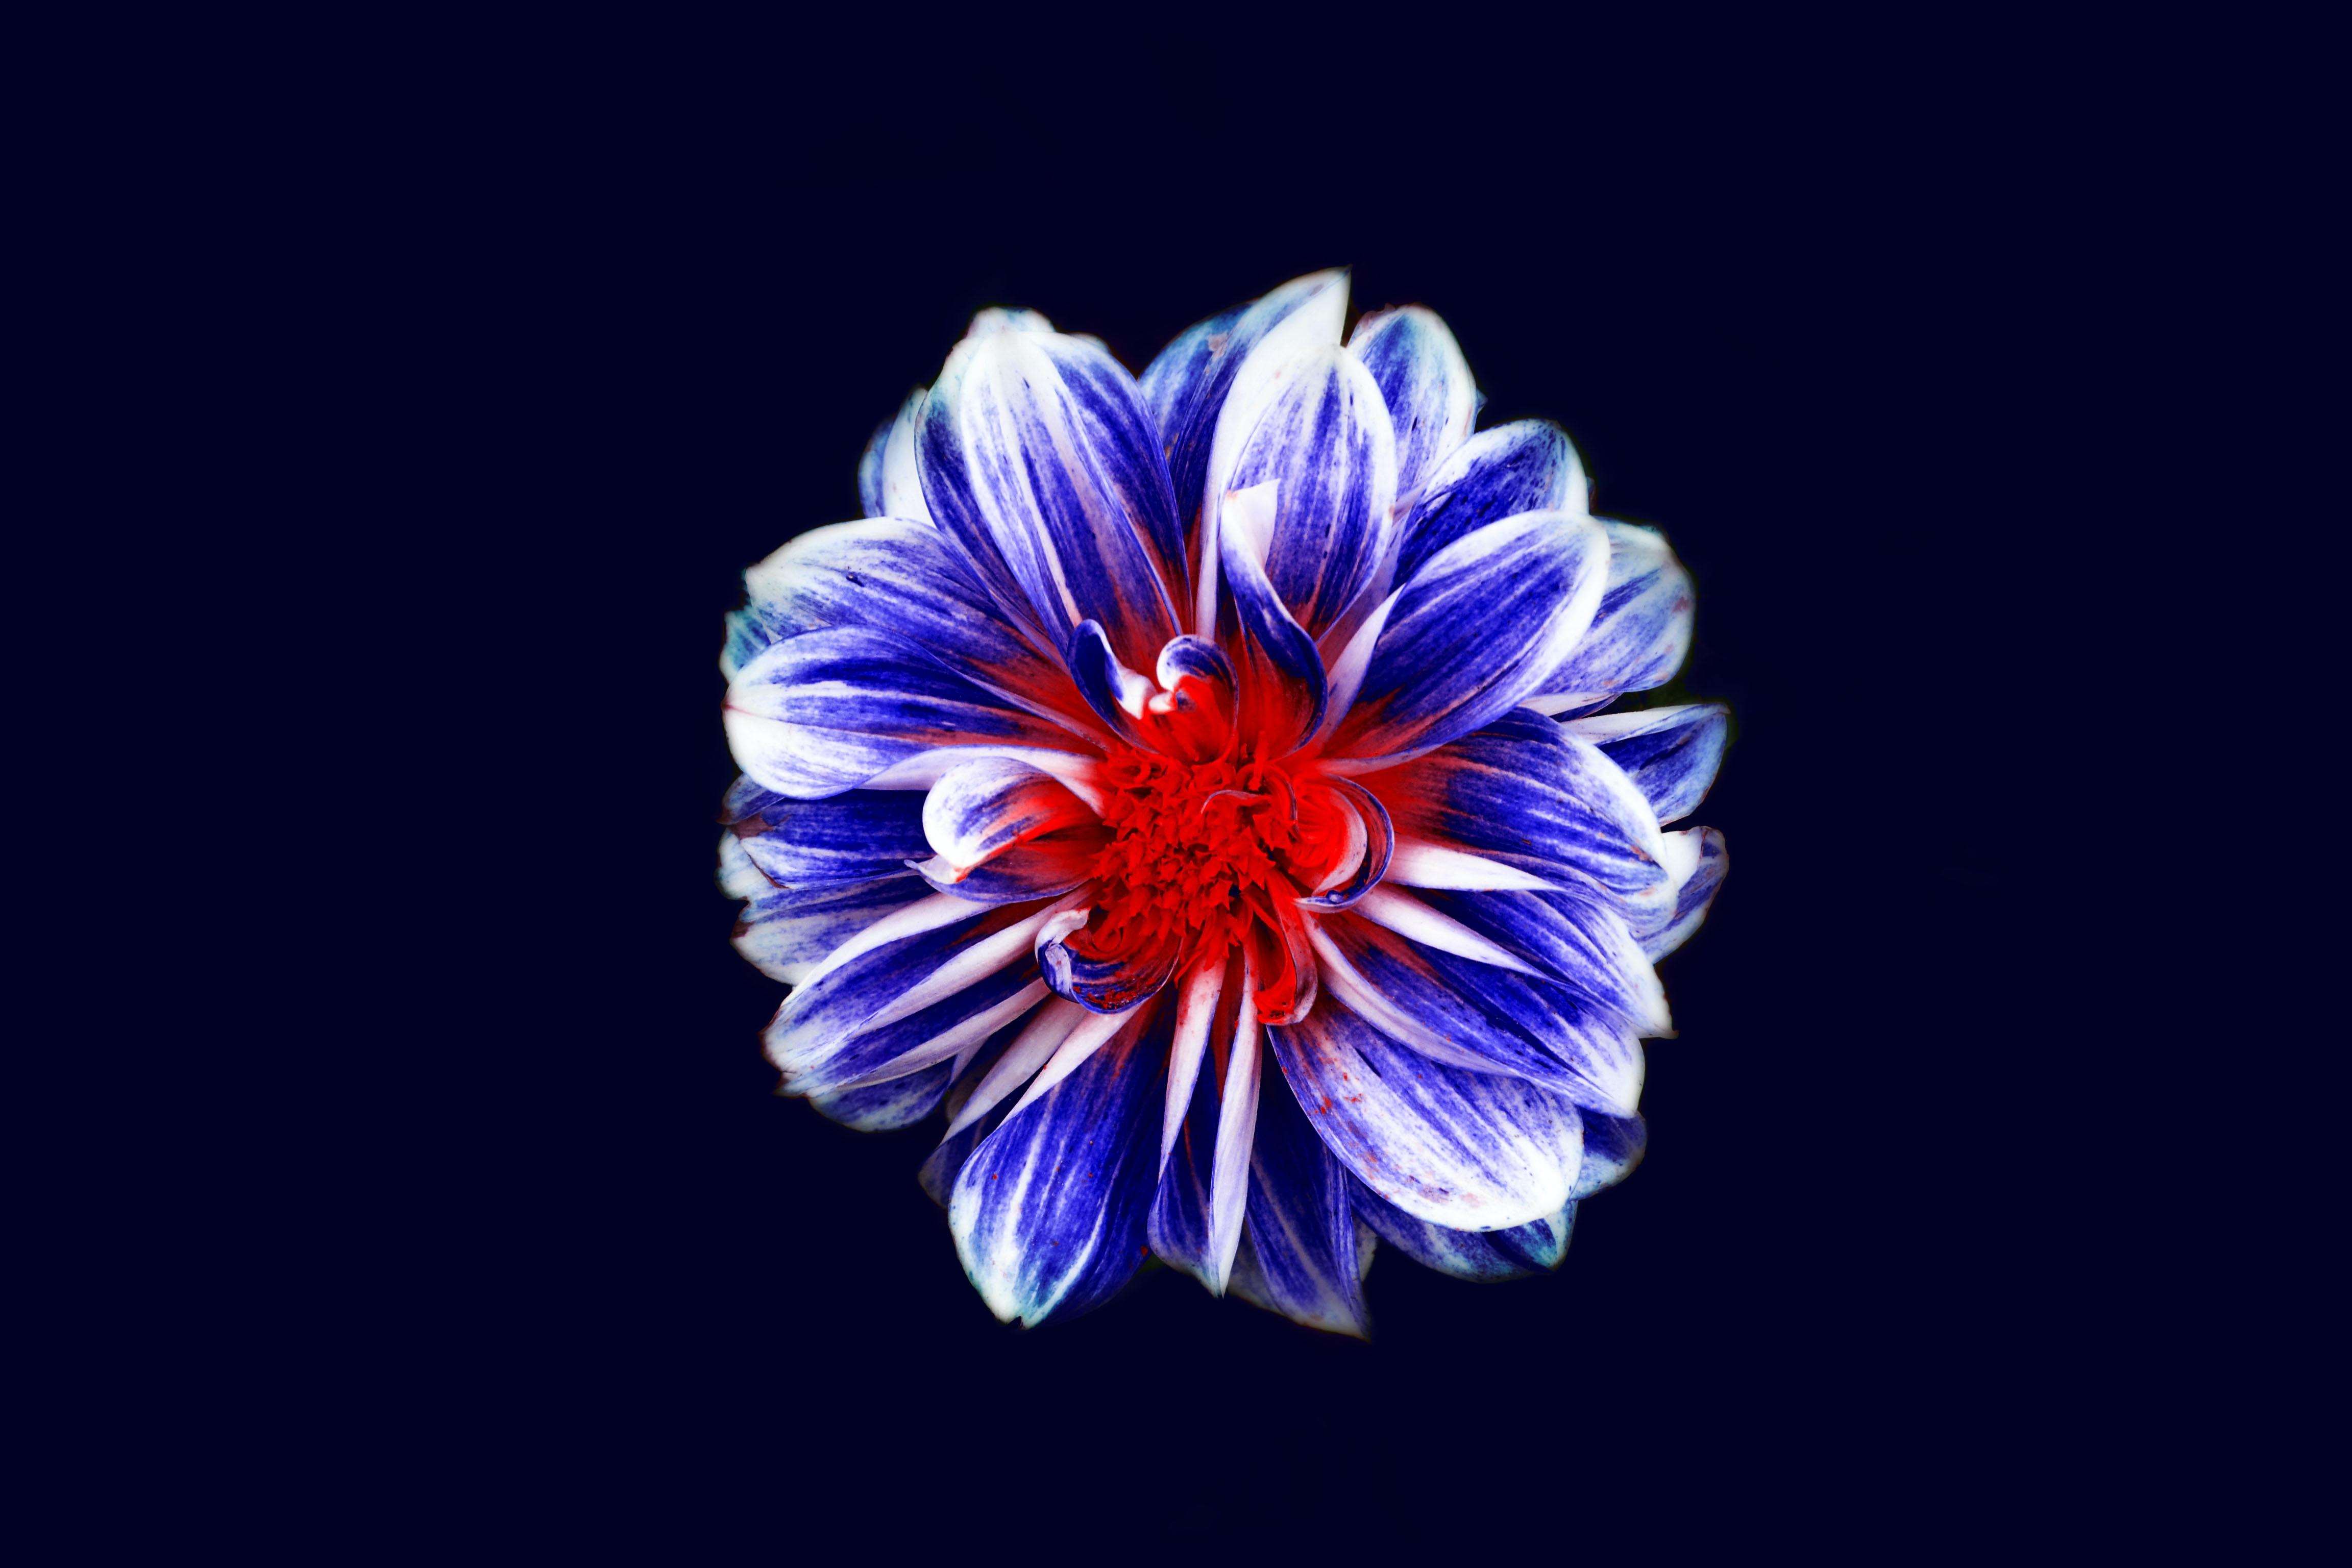 blue and red flower digital wallpaper